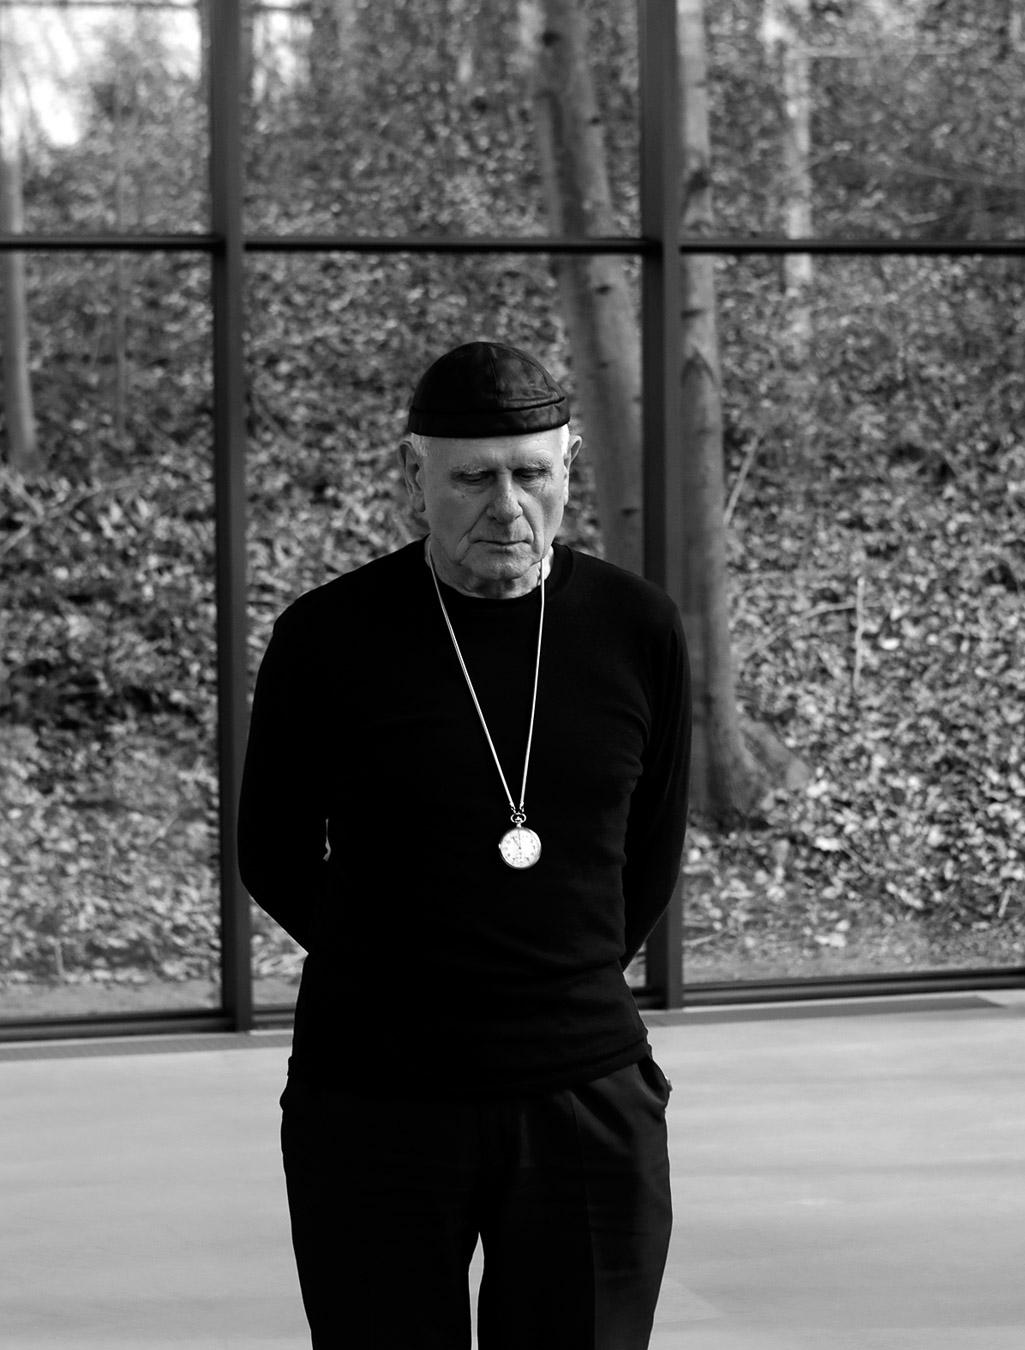 Klaus Rinke, Skulpturenpark, Waldfrieden, Wuppertal 2018-04-17